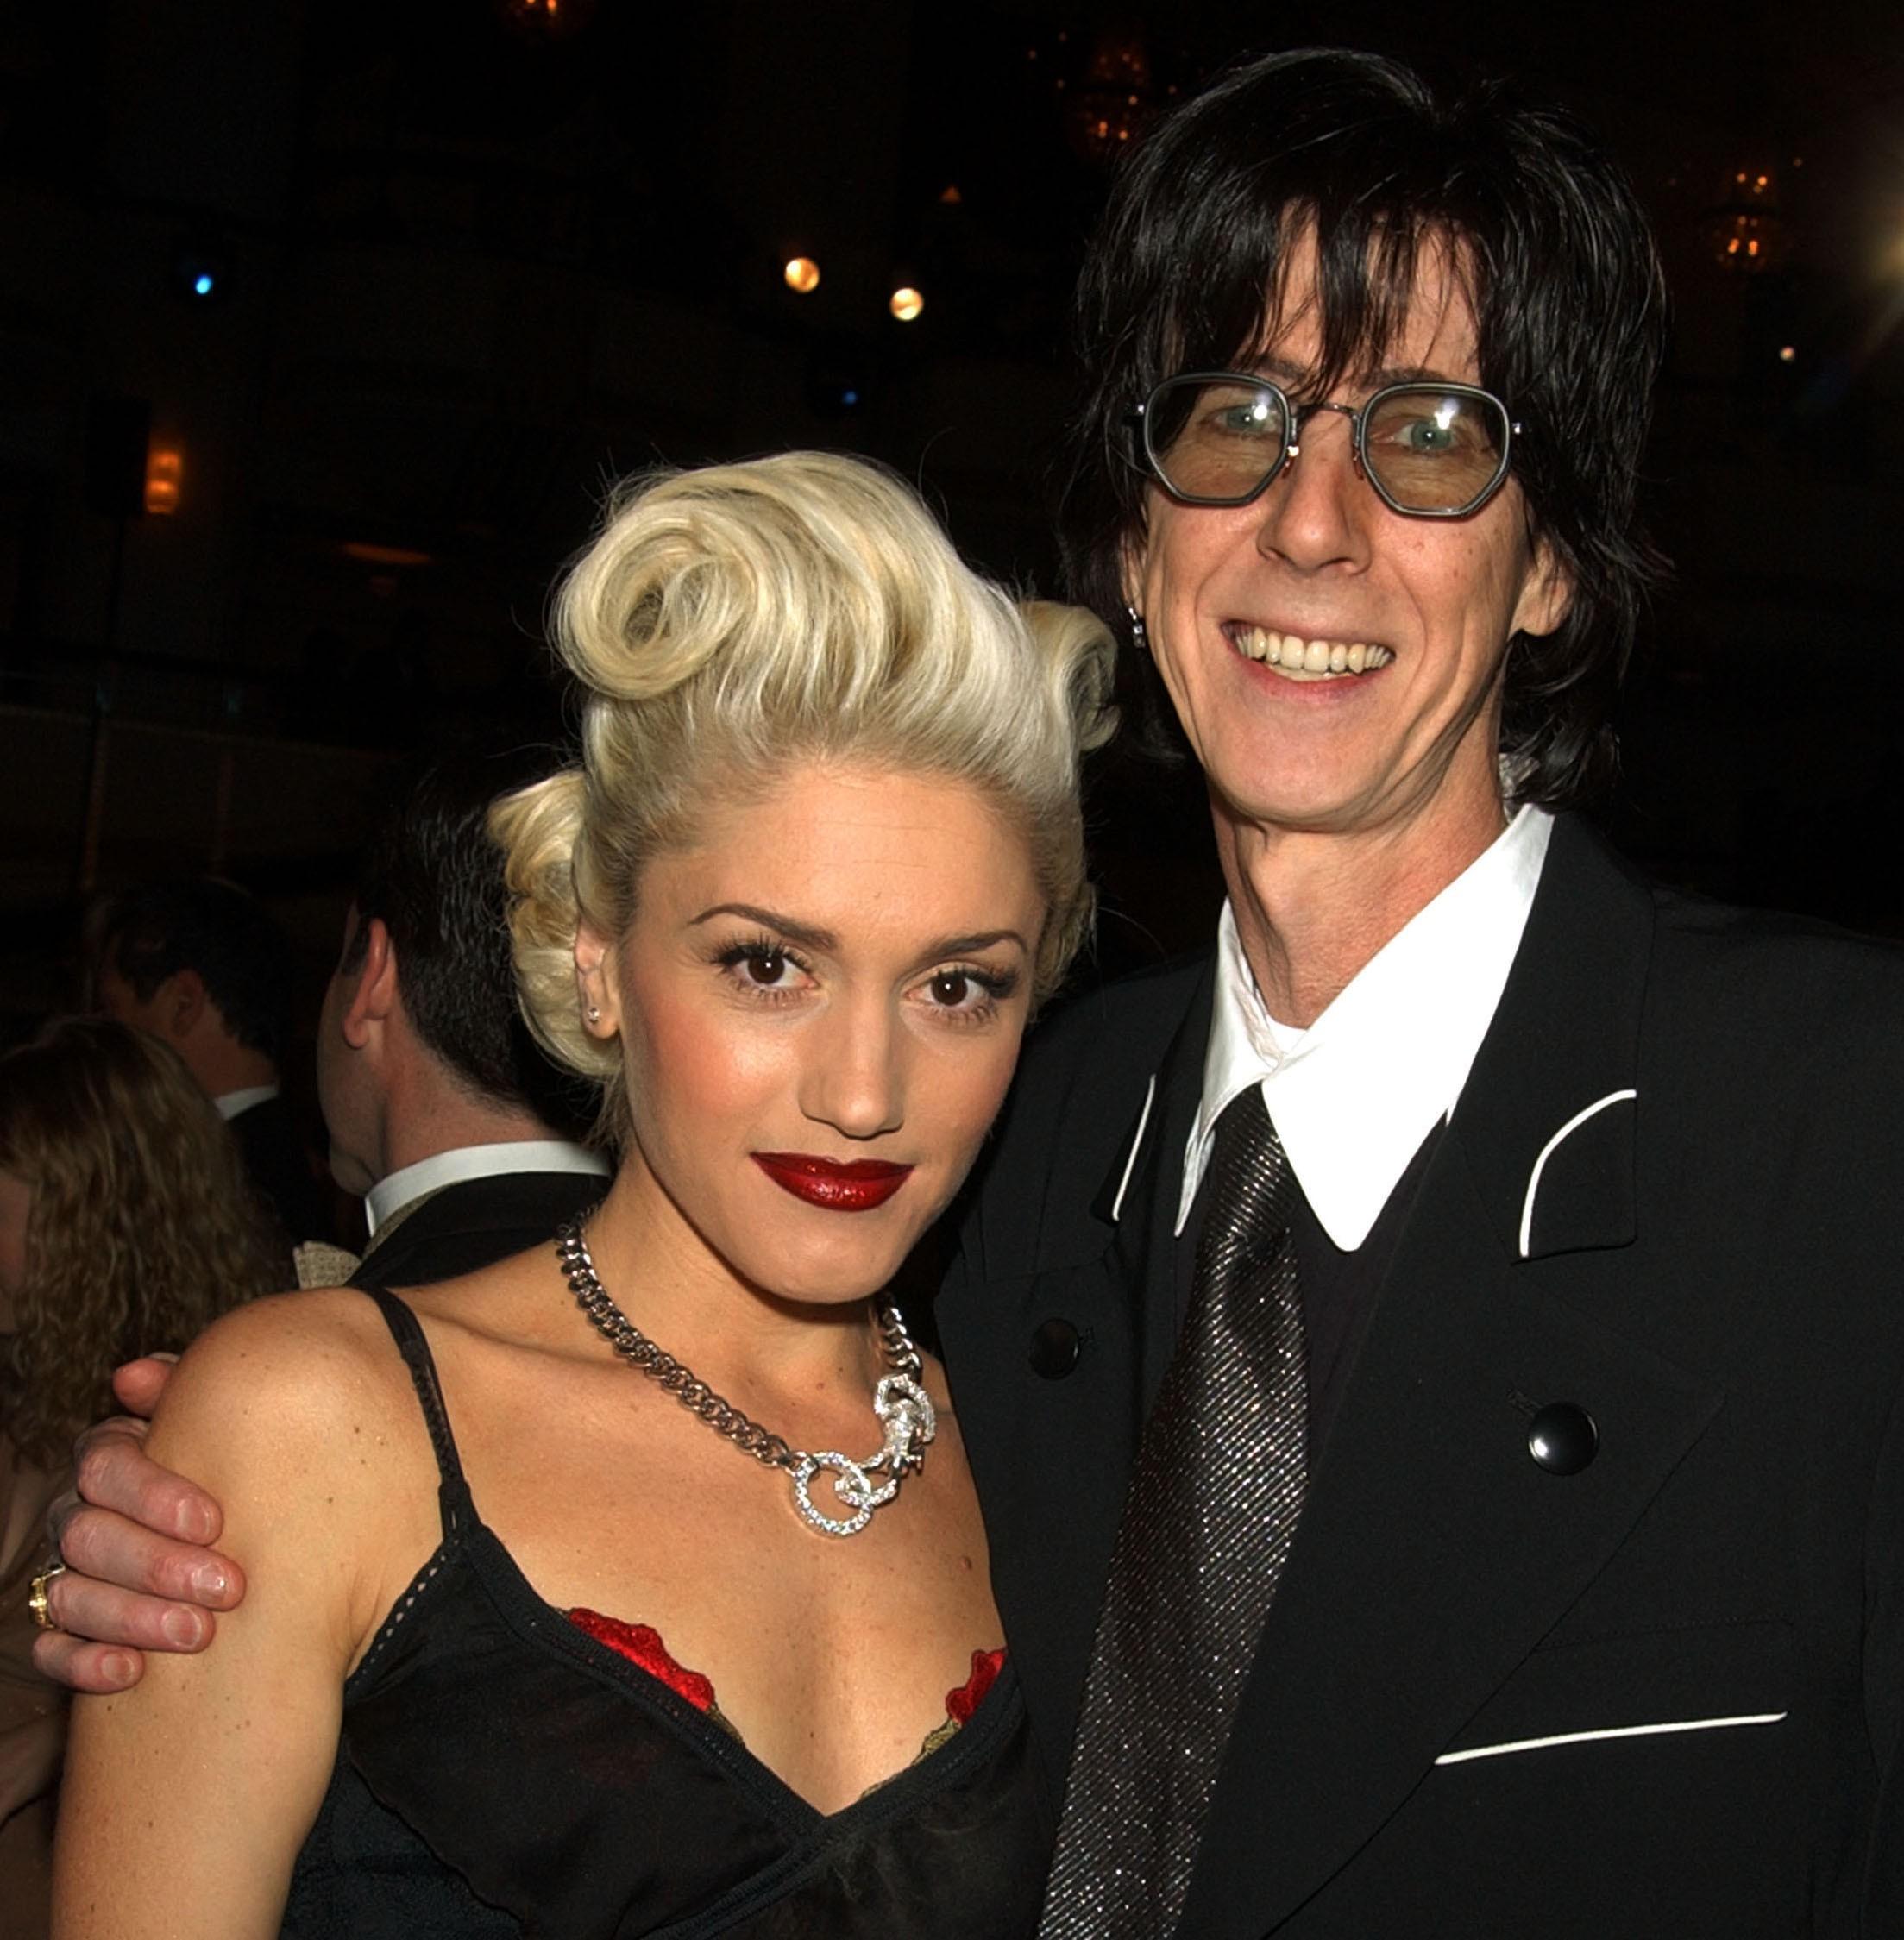 Gwen Stefani & Ric Ocasek